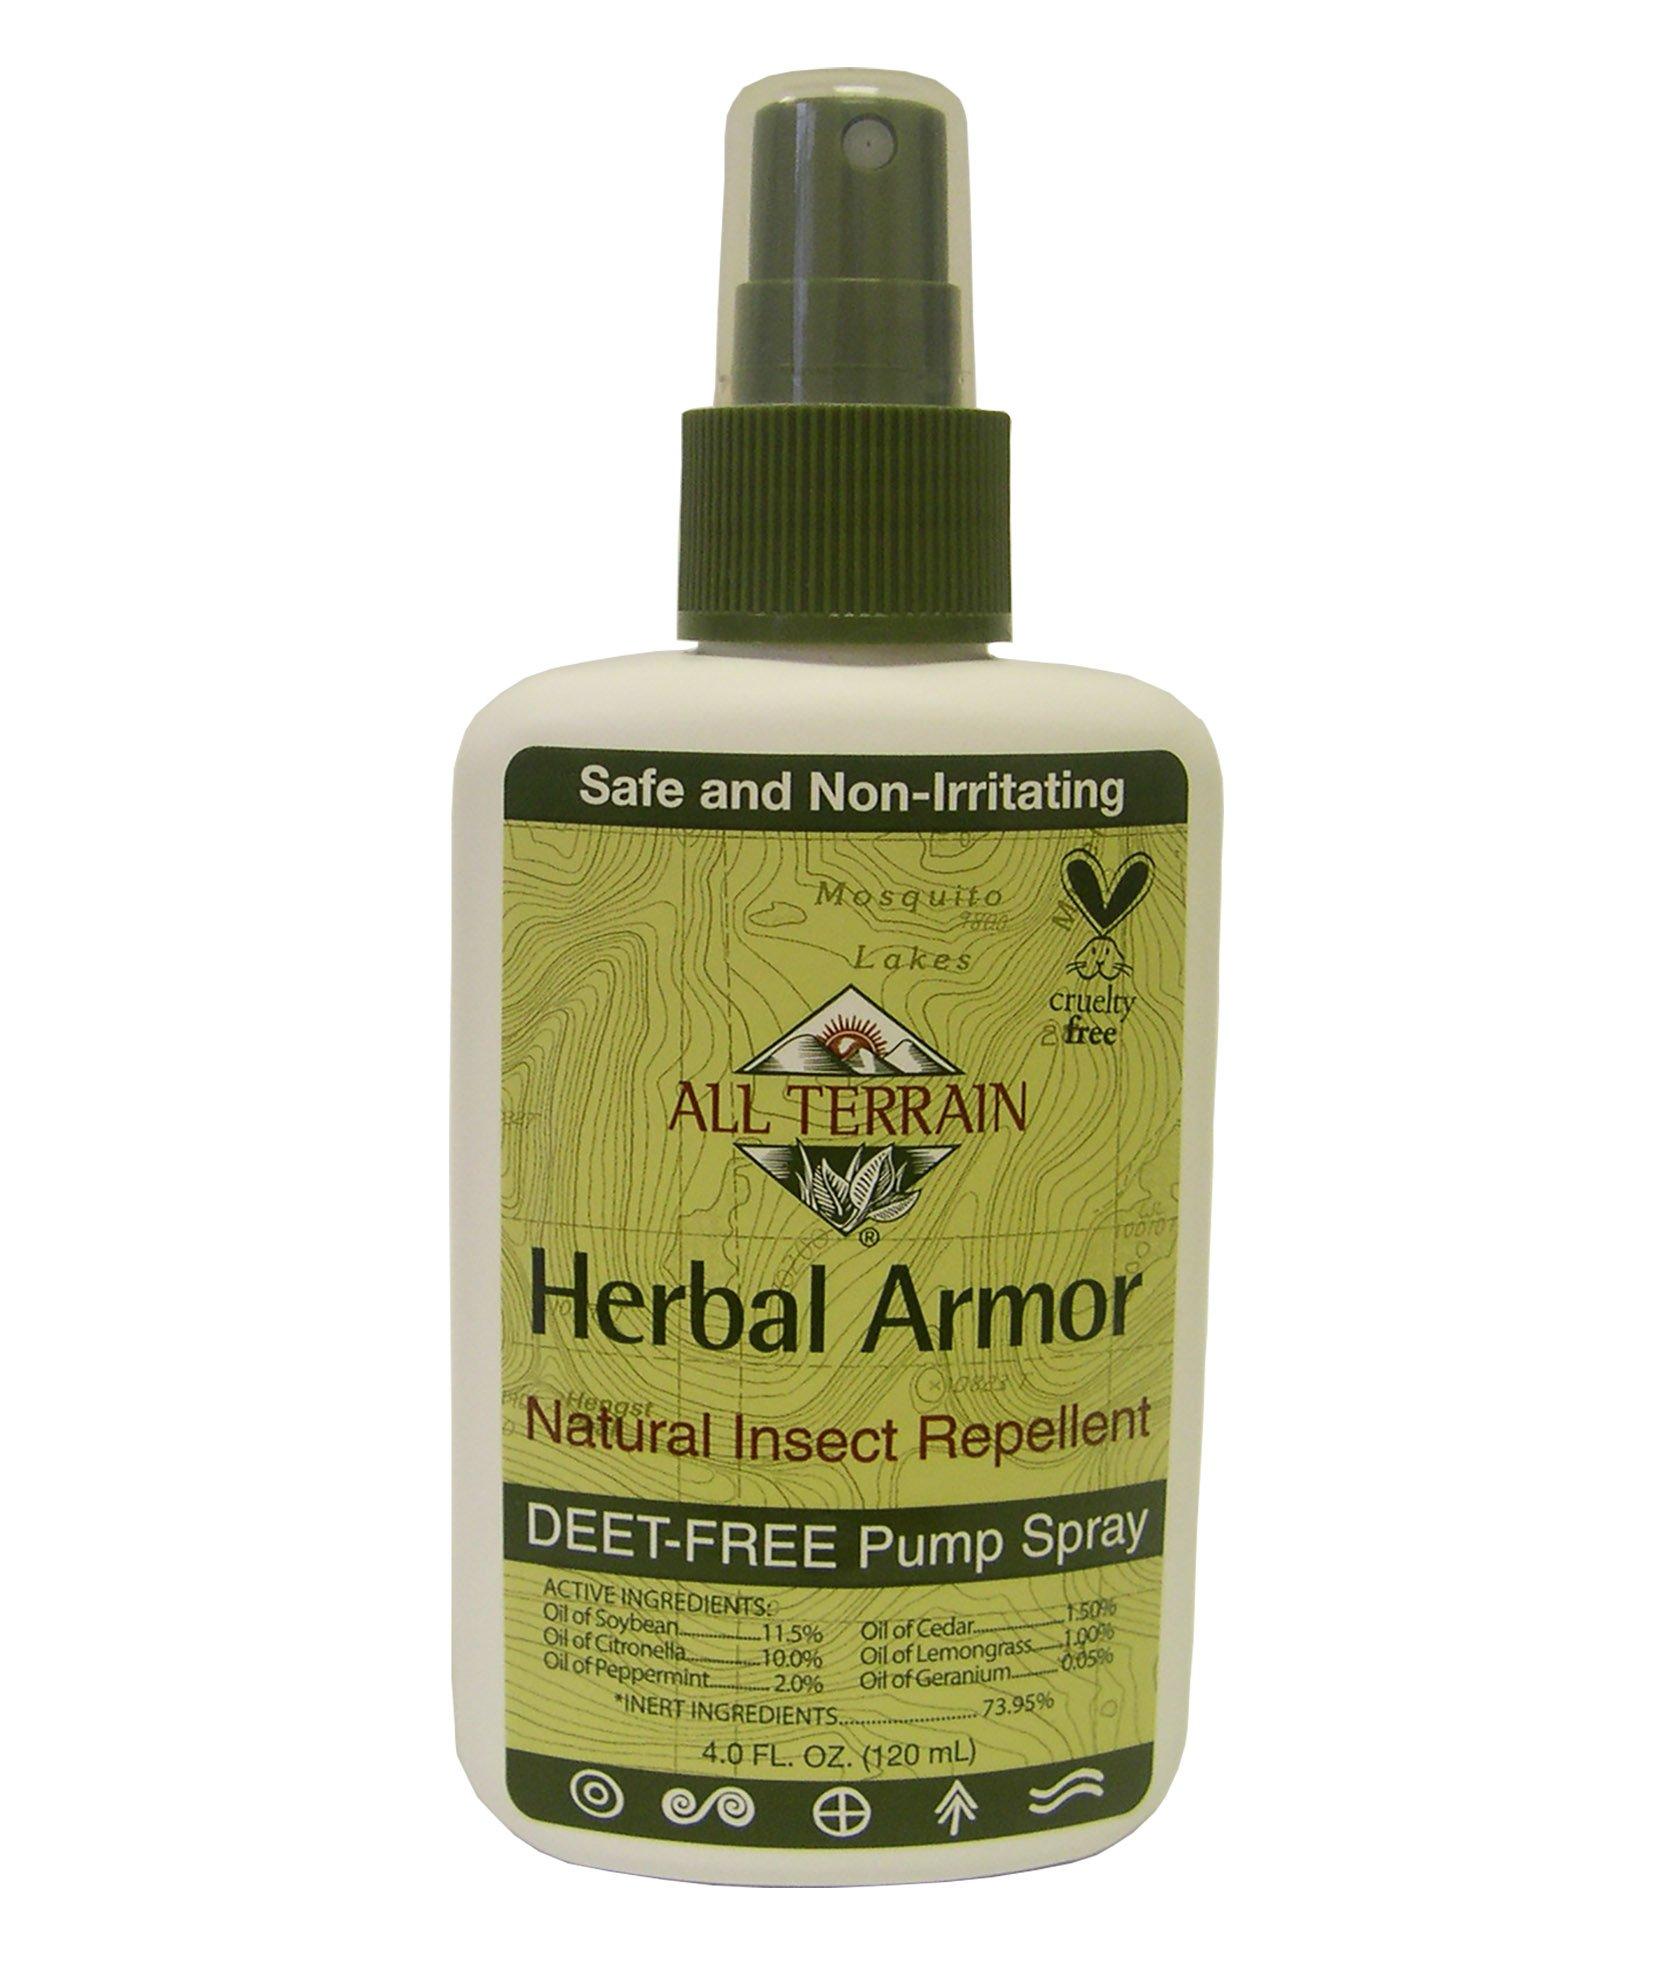 all terrain herbal armor deet free insect repellent pump spray